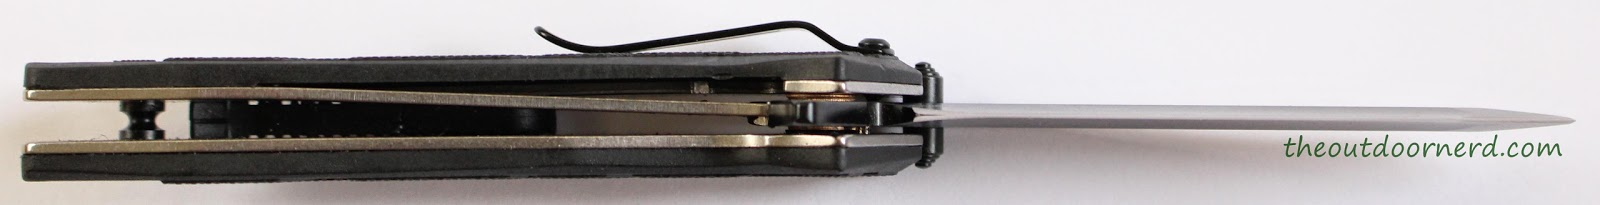 Kershaw Brawler Pocket Knife Close Up Of Lockup 1